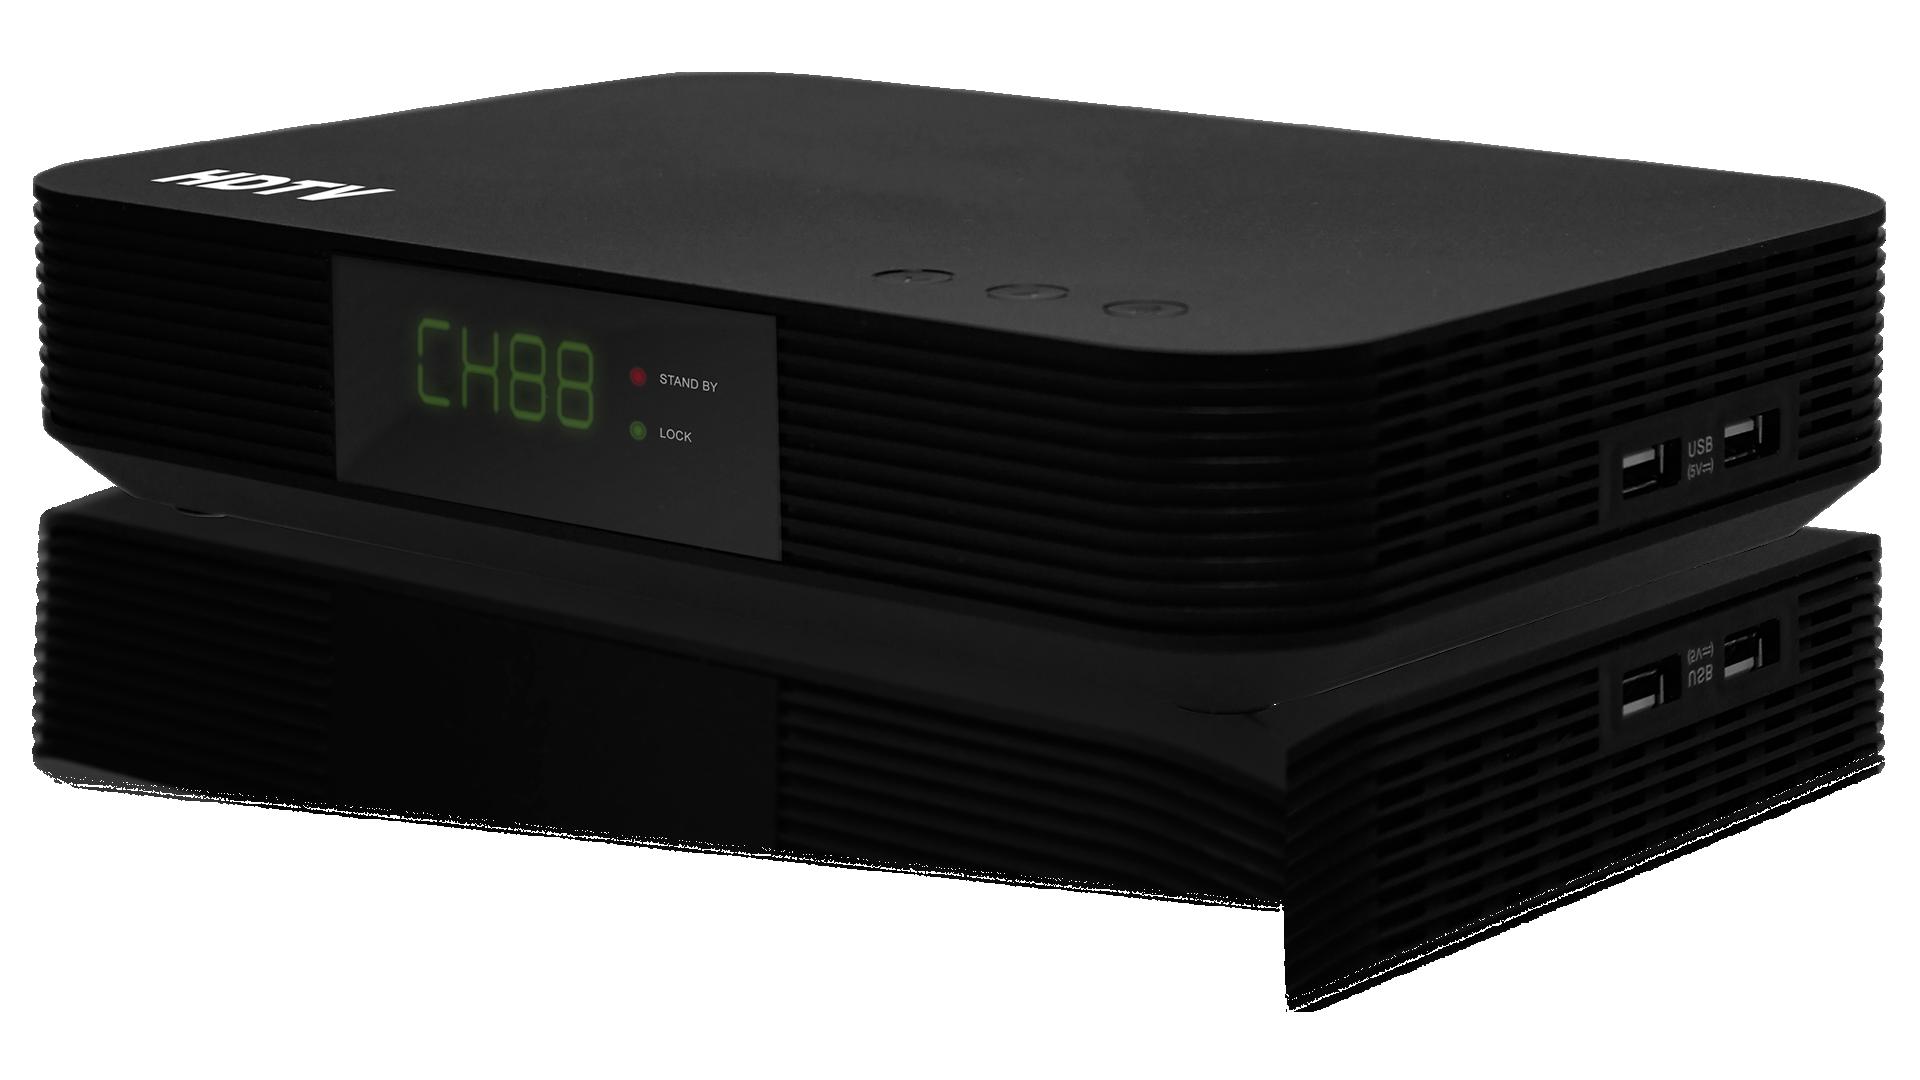 VMX3-1: Triple-Tuner High-Definition MPEG-2/4 QAM Set-Top Box With Verimatrix<sup>&reg;</sup> CAS